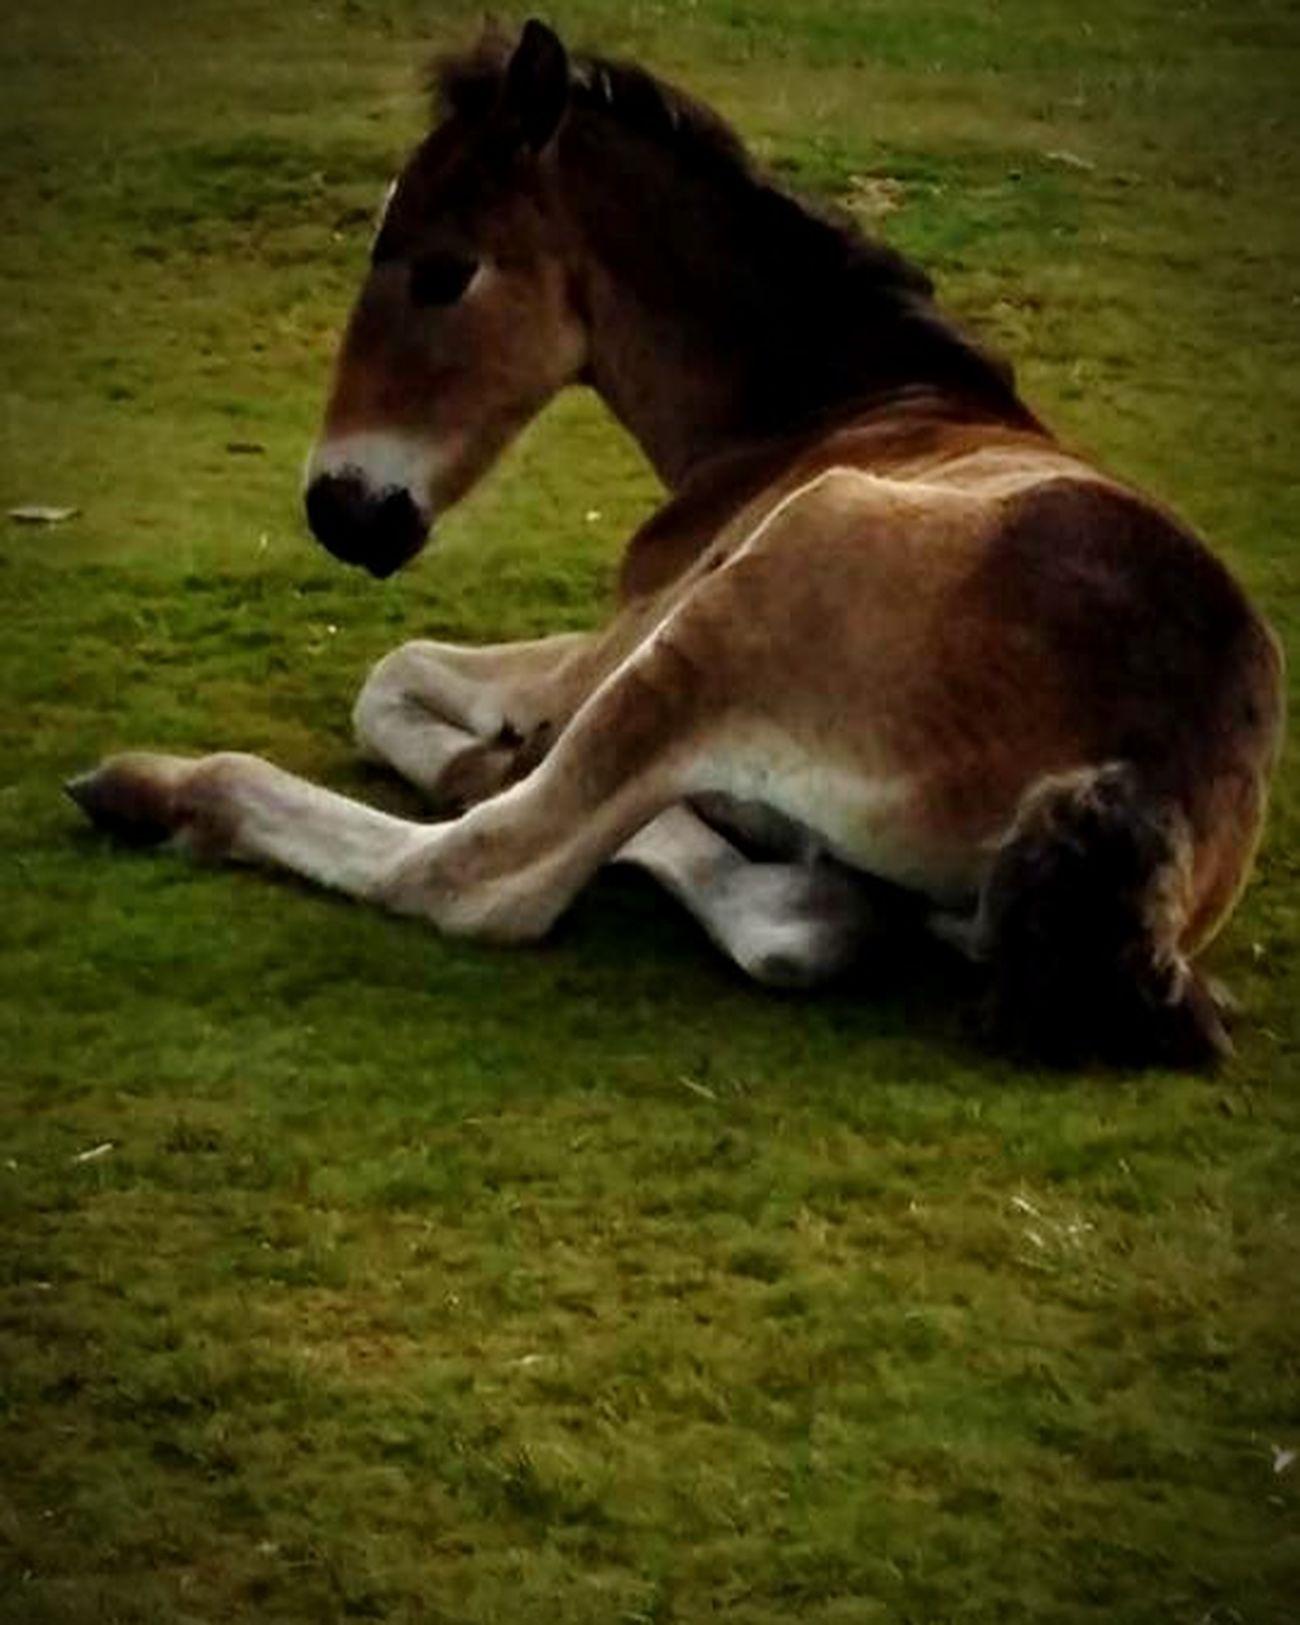 Pretty moorland foal Horses Pony Foals Grass Cornwall Bodmin Moor Moorland Animals Nature